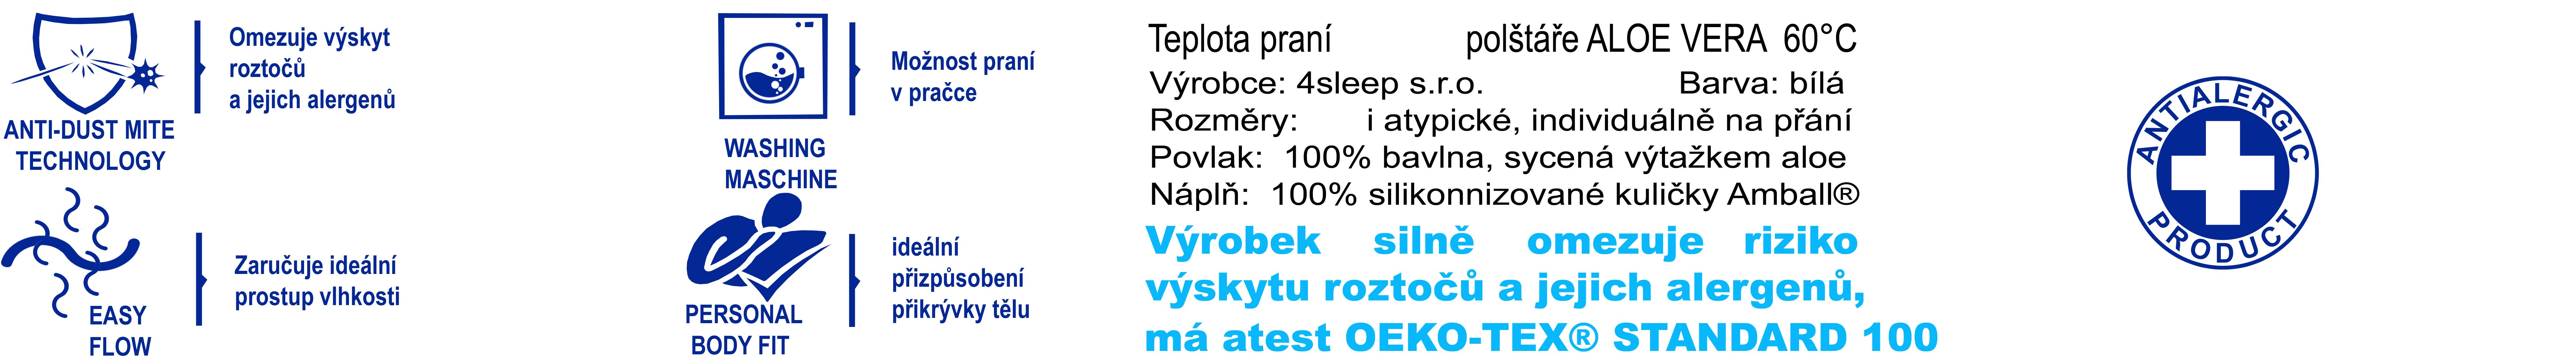 4sleep.cz antialergická přikrývka Aloe veraaloe-vera-60-c-1